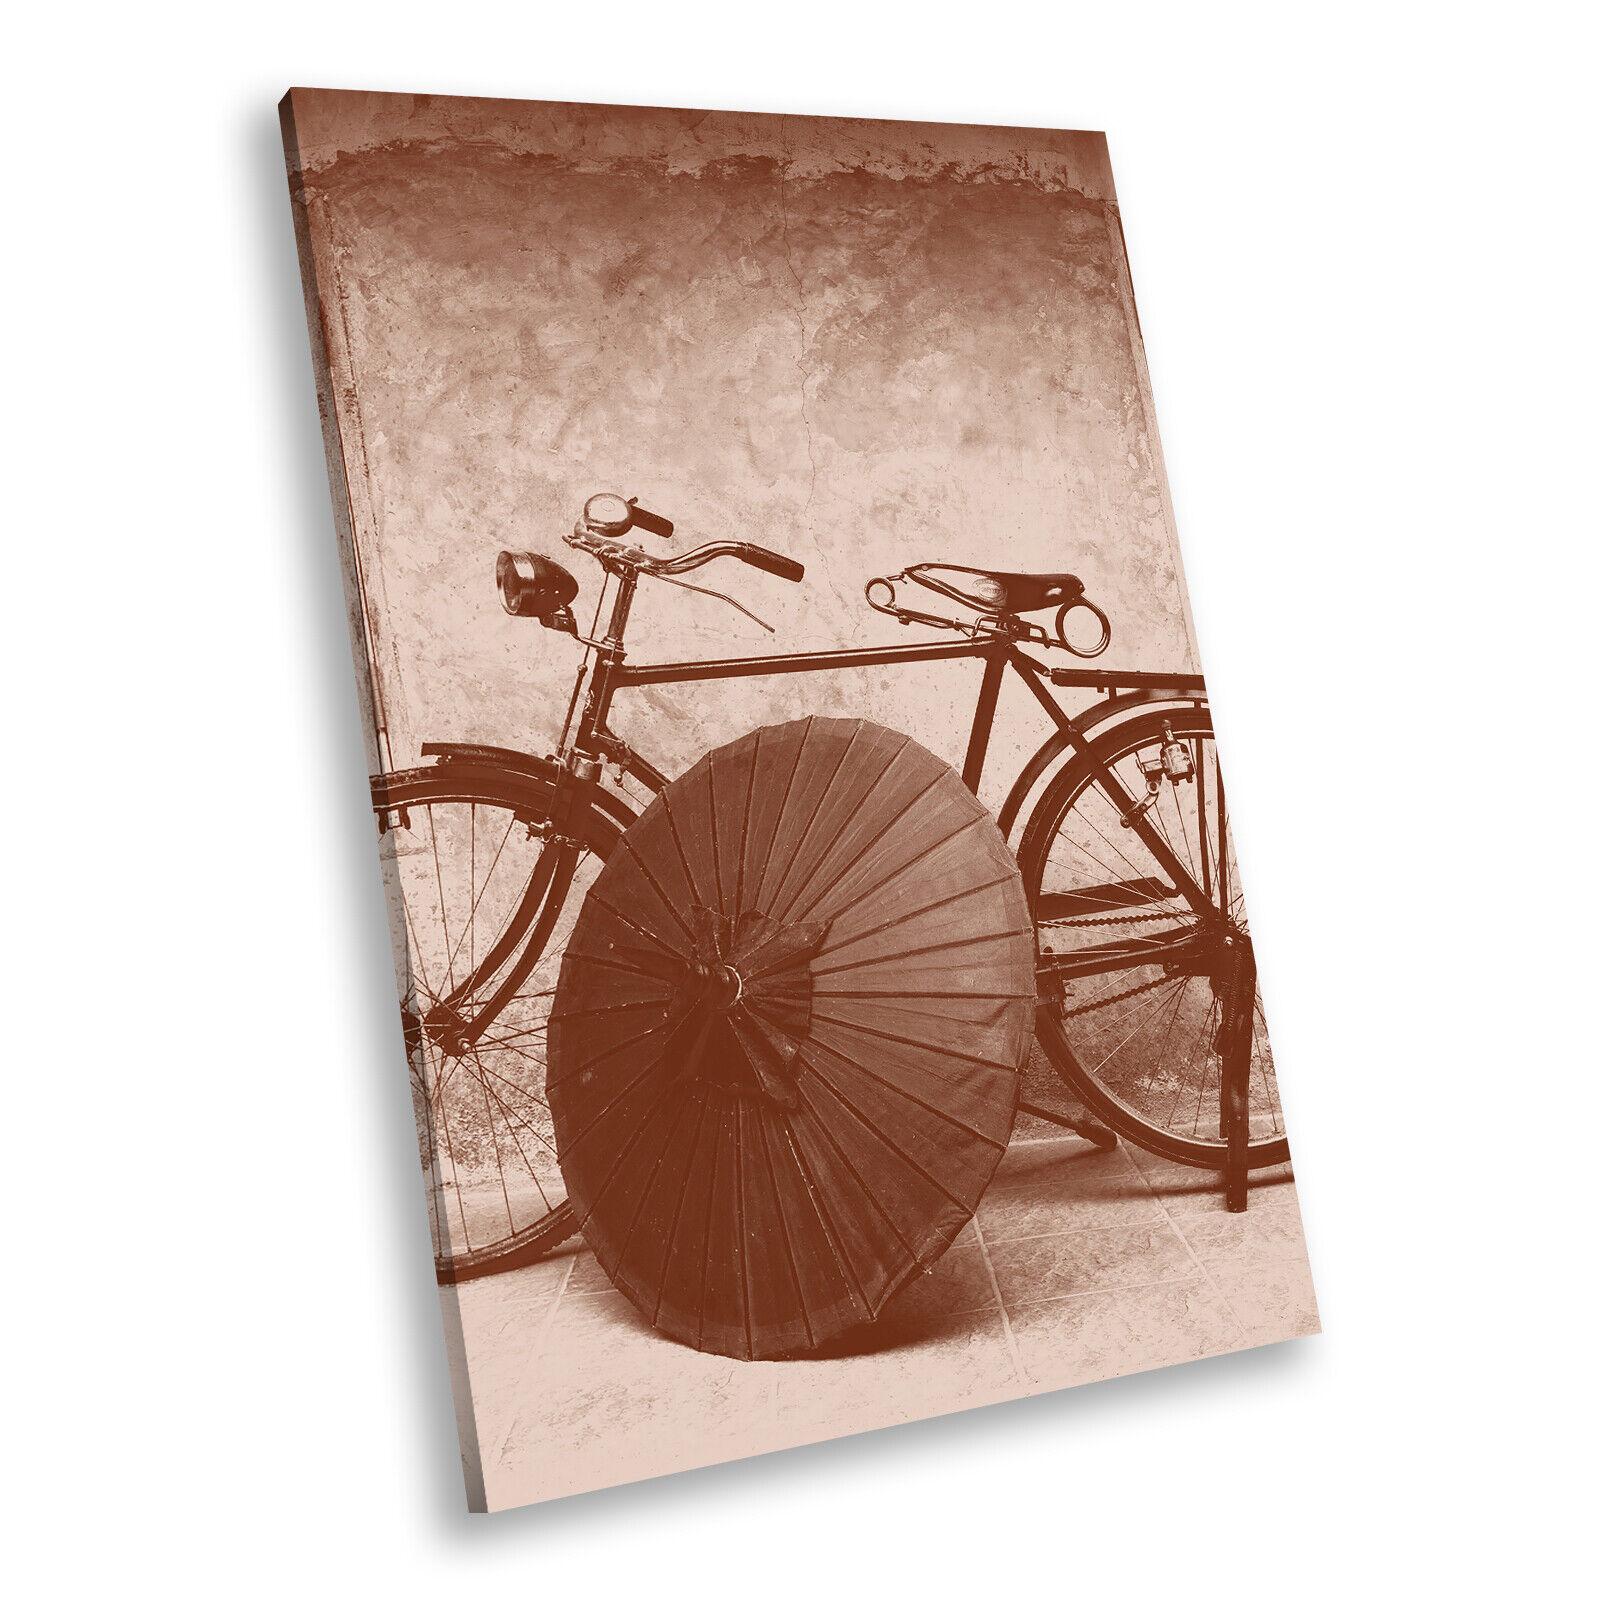 Vintage braun Sepia Bike Portrait Scenic Canvas Wall Art Large Picture Prints